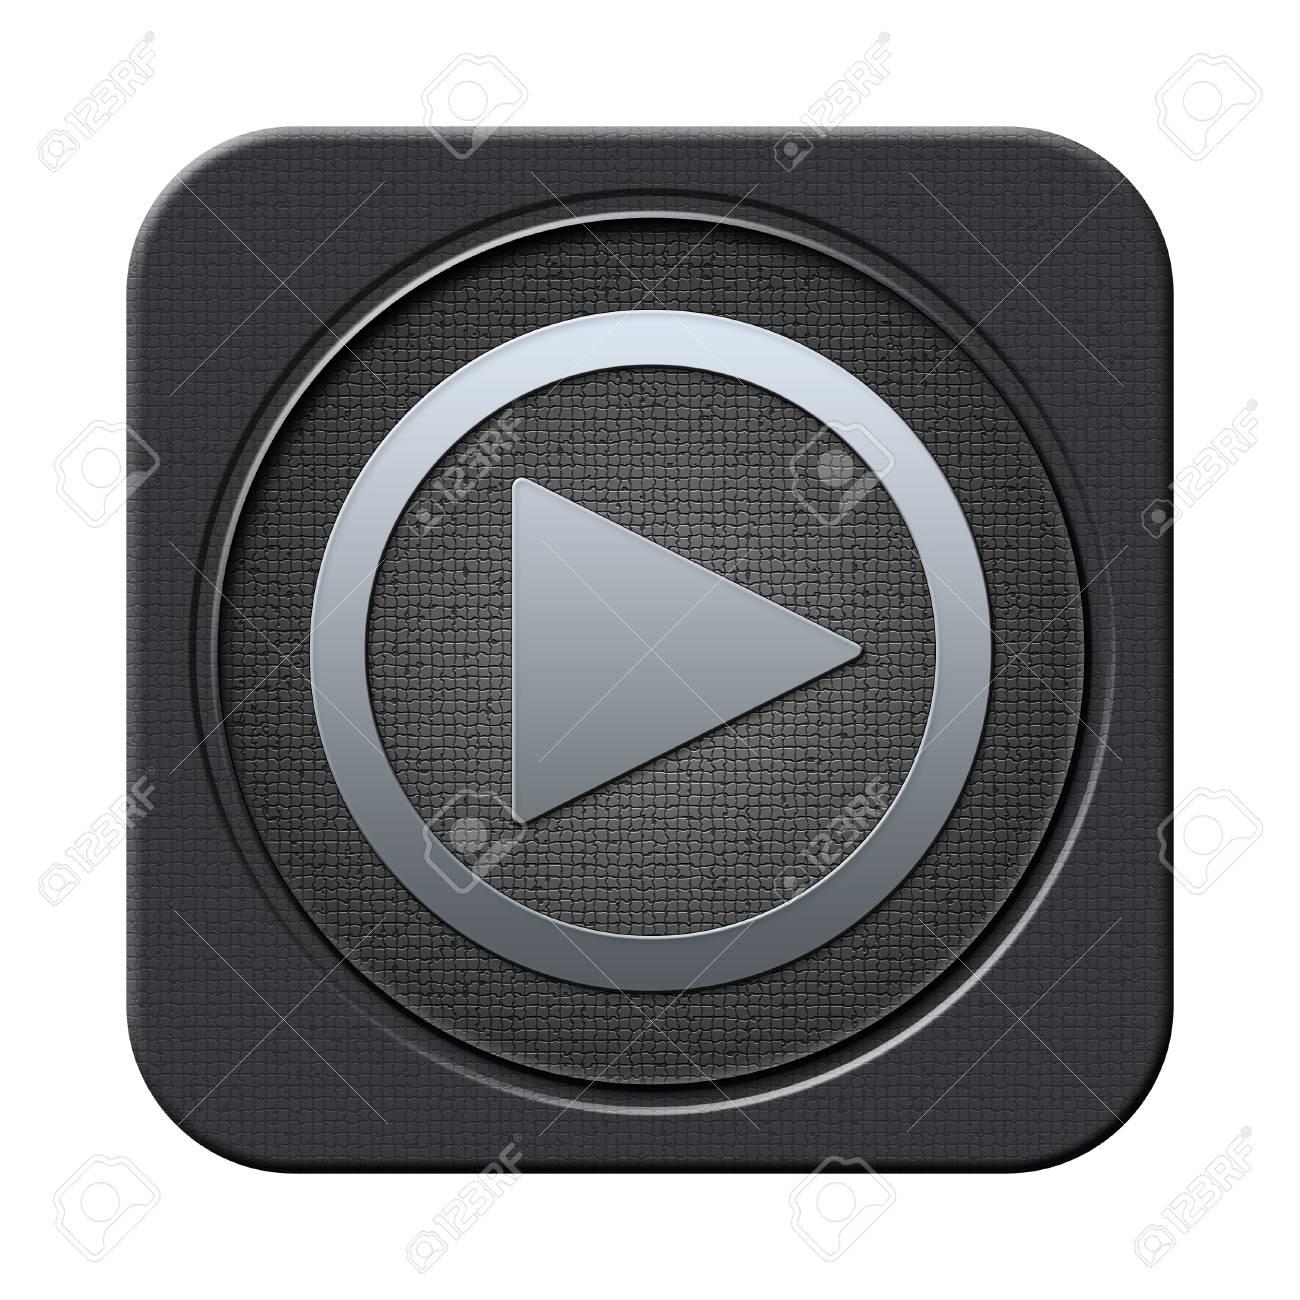 Play button Stock Photo - 23682222